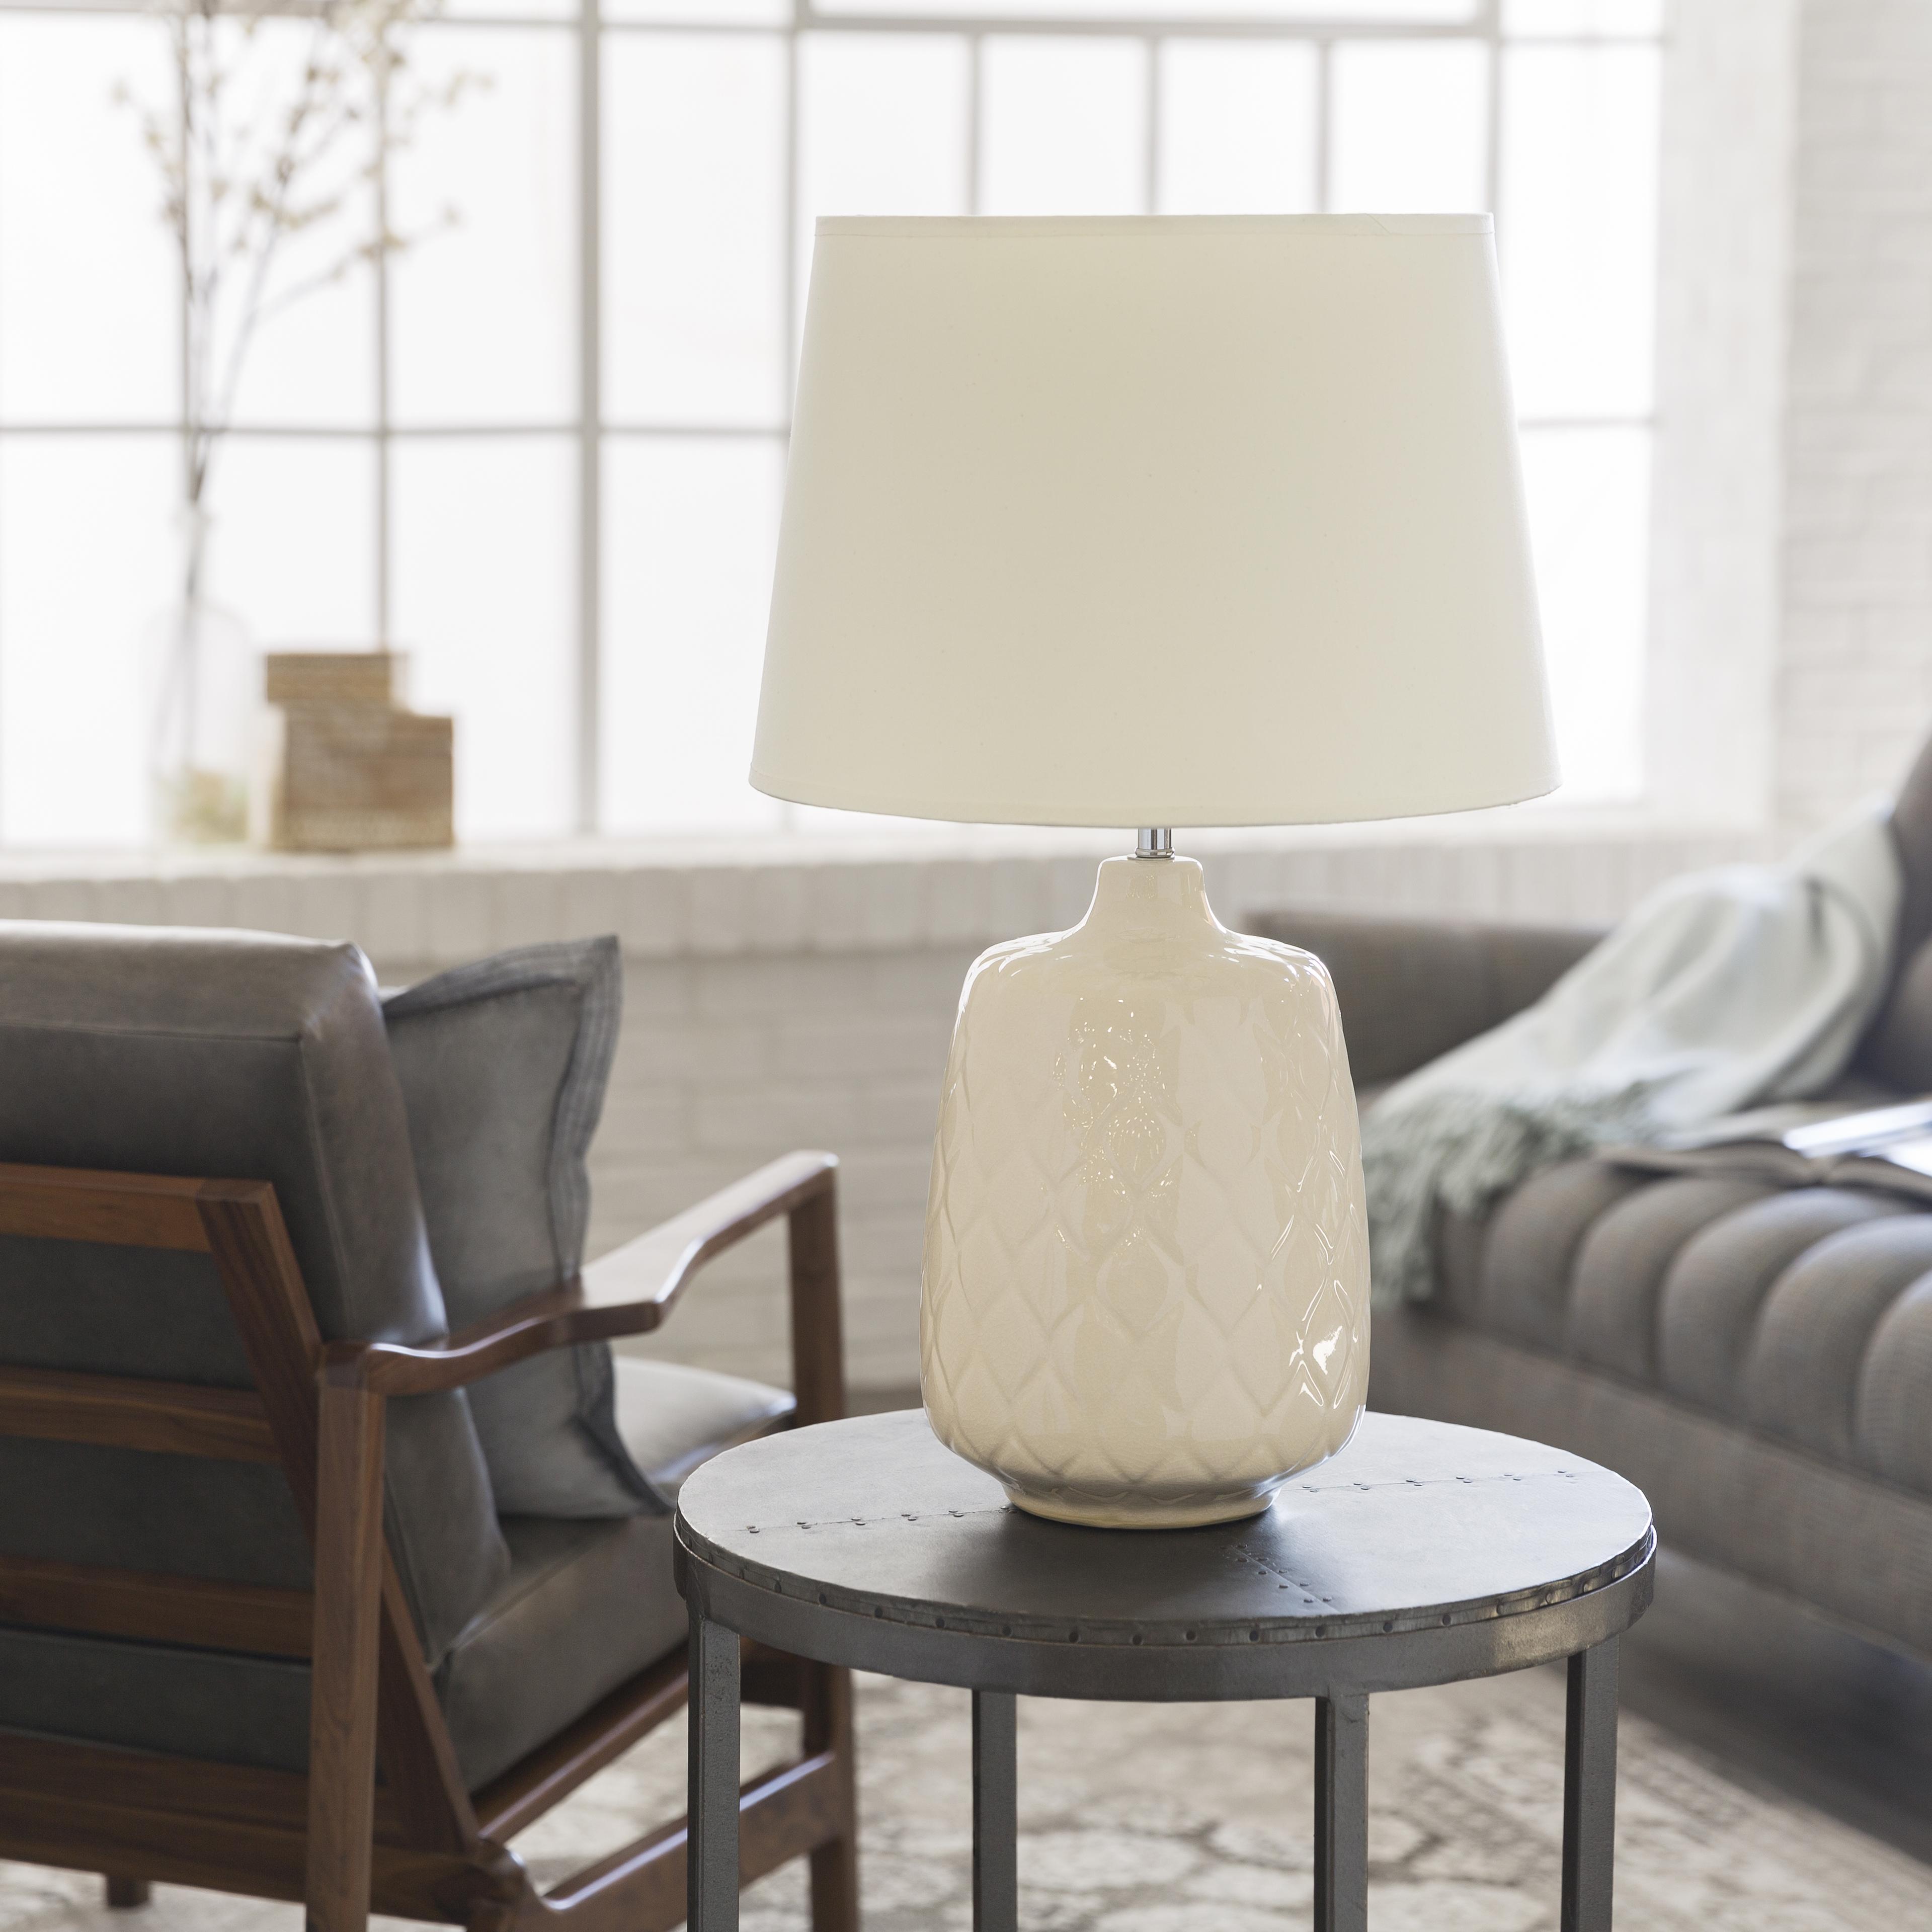 Claiborne 23.5 x 15 x 15 Table Lamp